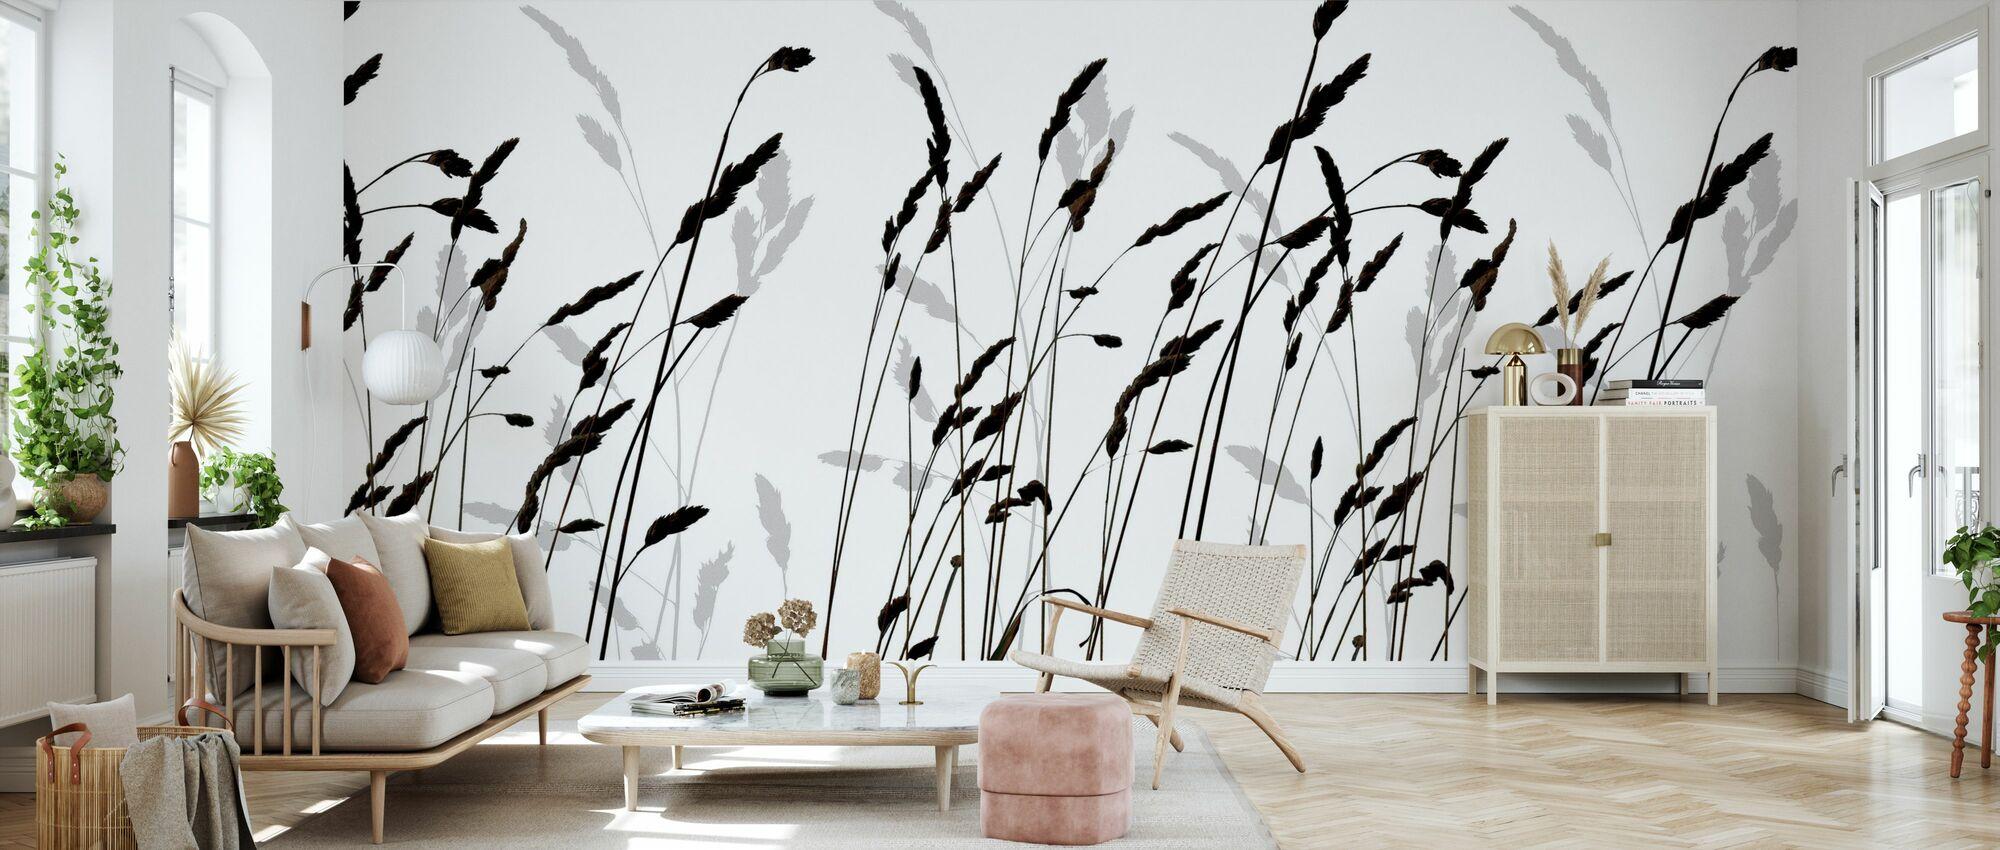 Straw - Black - Wallpaper - Living Room